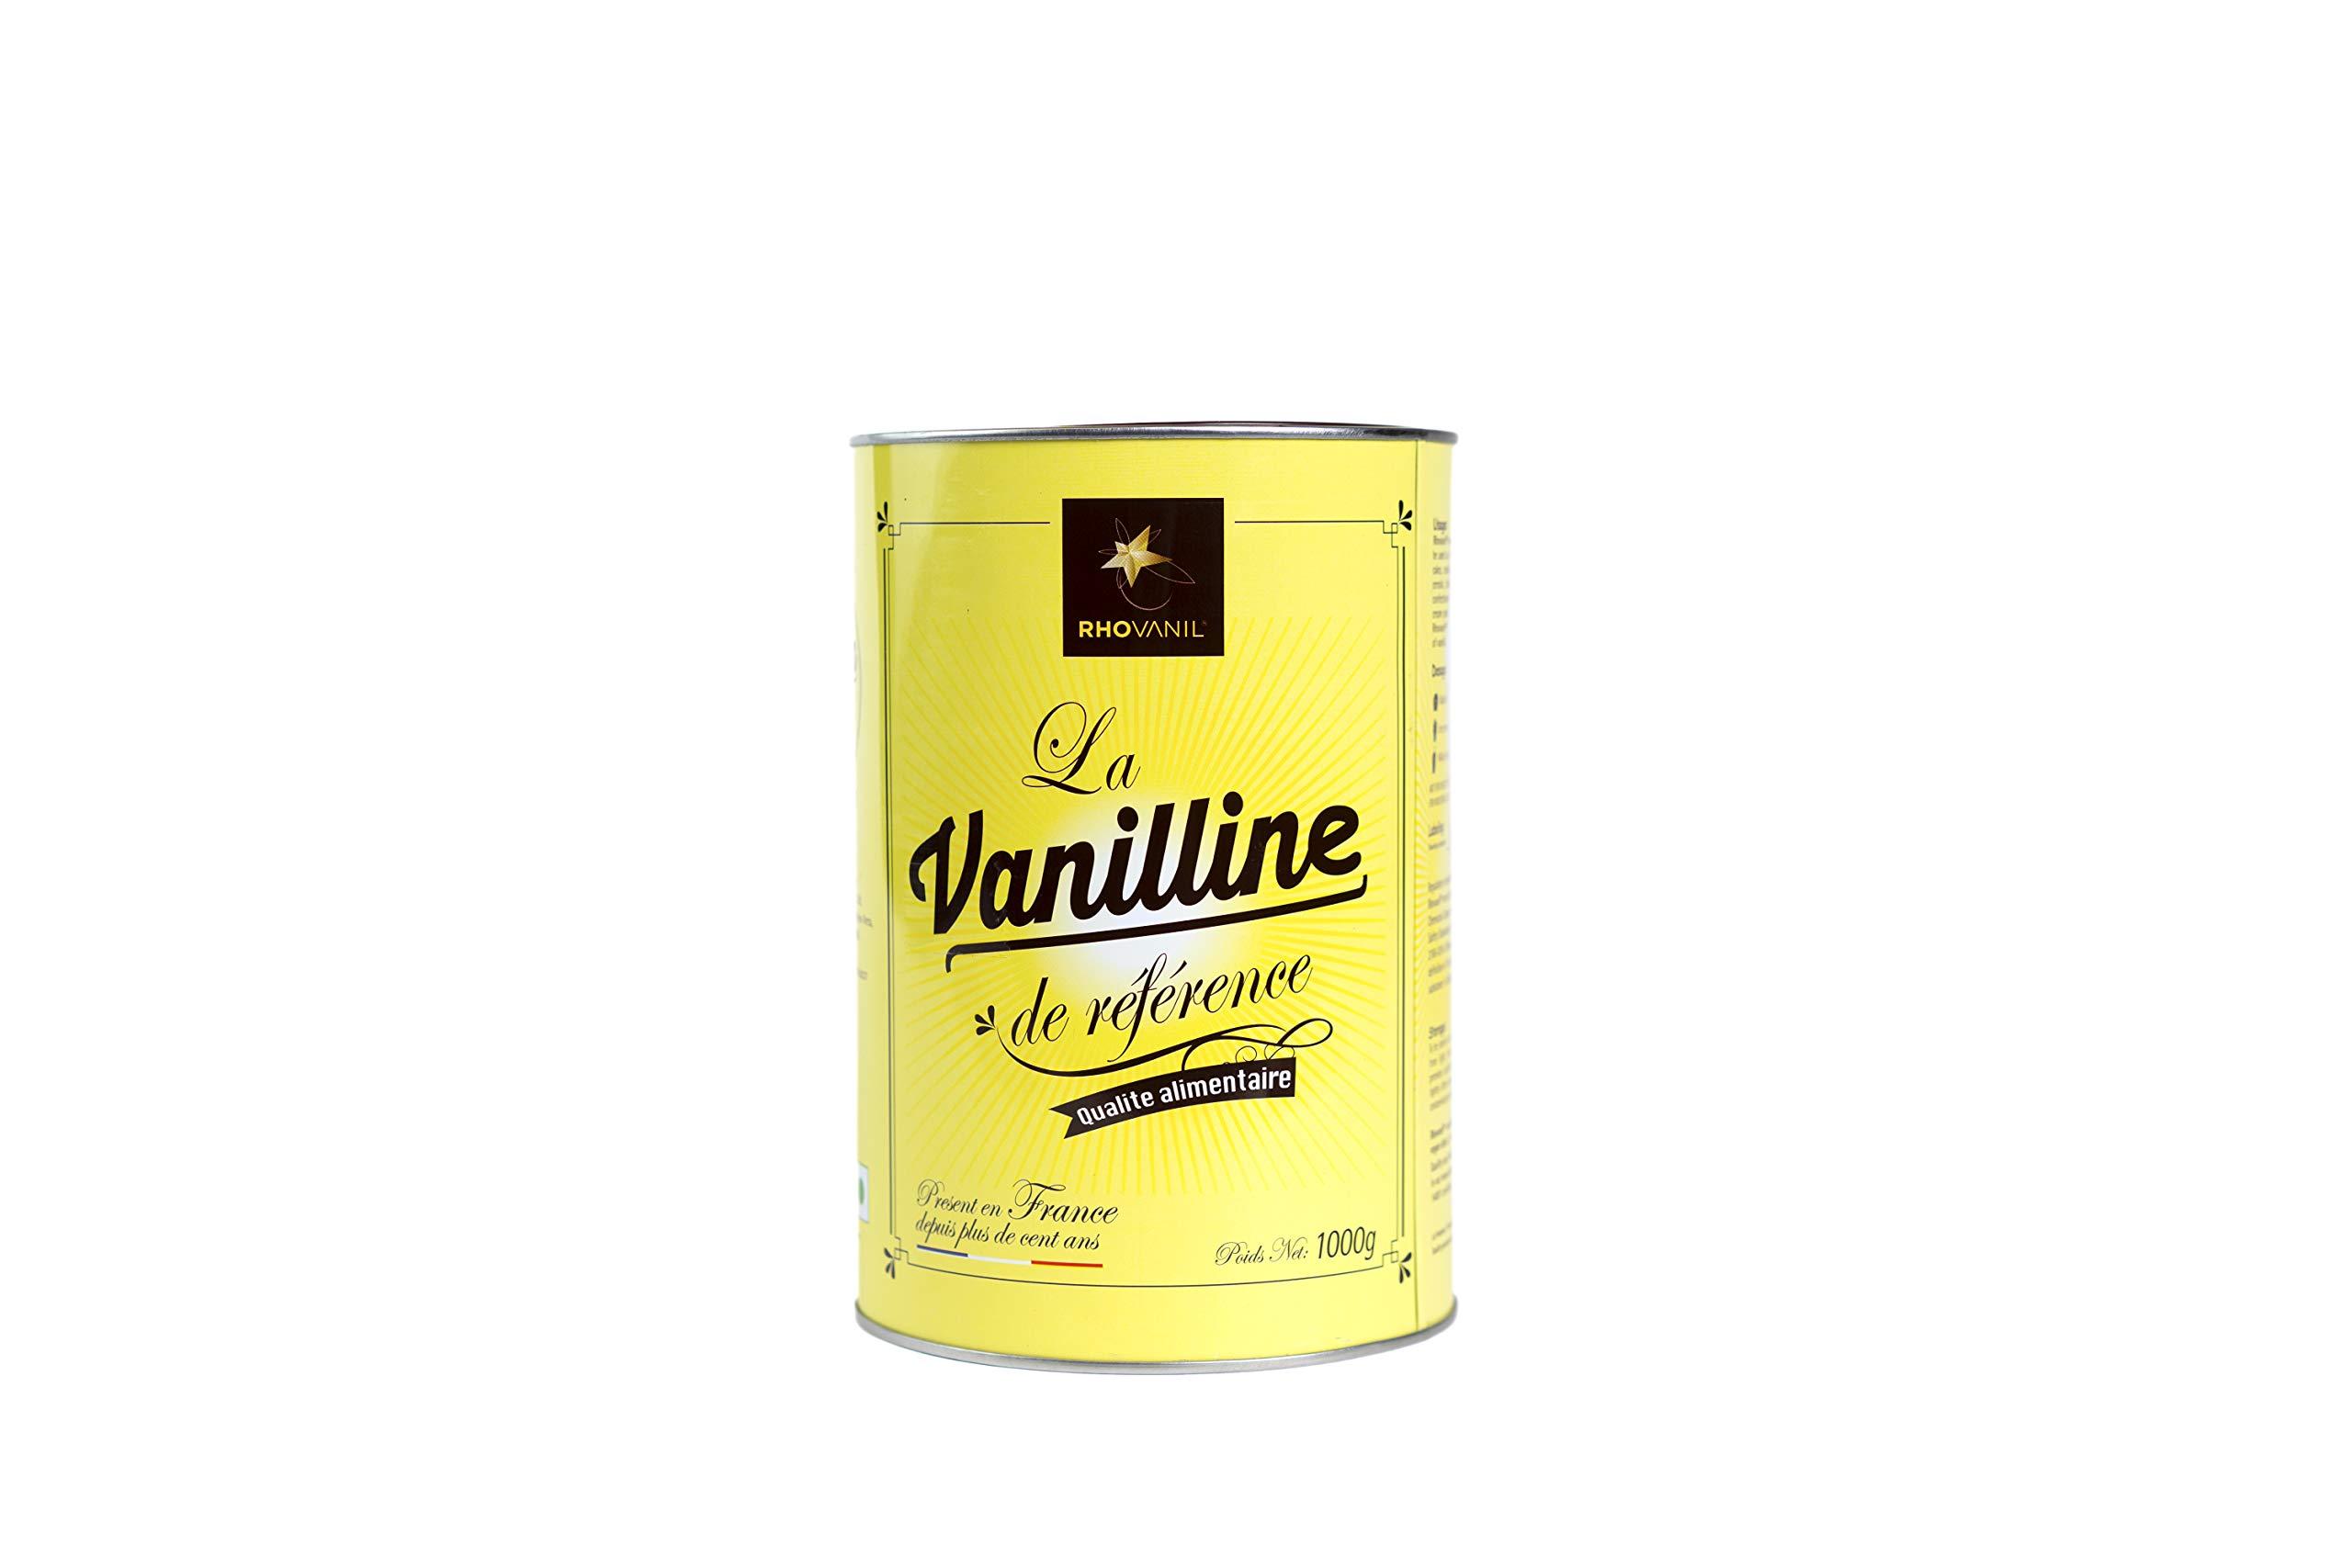 Vanillin Powder Rhovanil 1kg by Solvay Rhovanil Vanillin (Image #1)